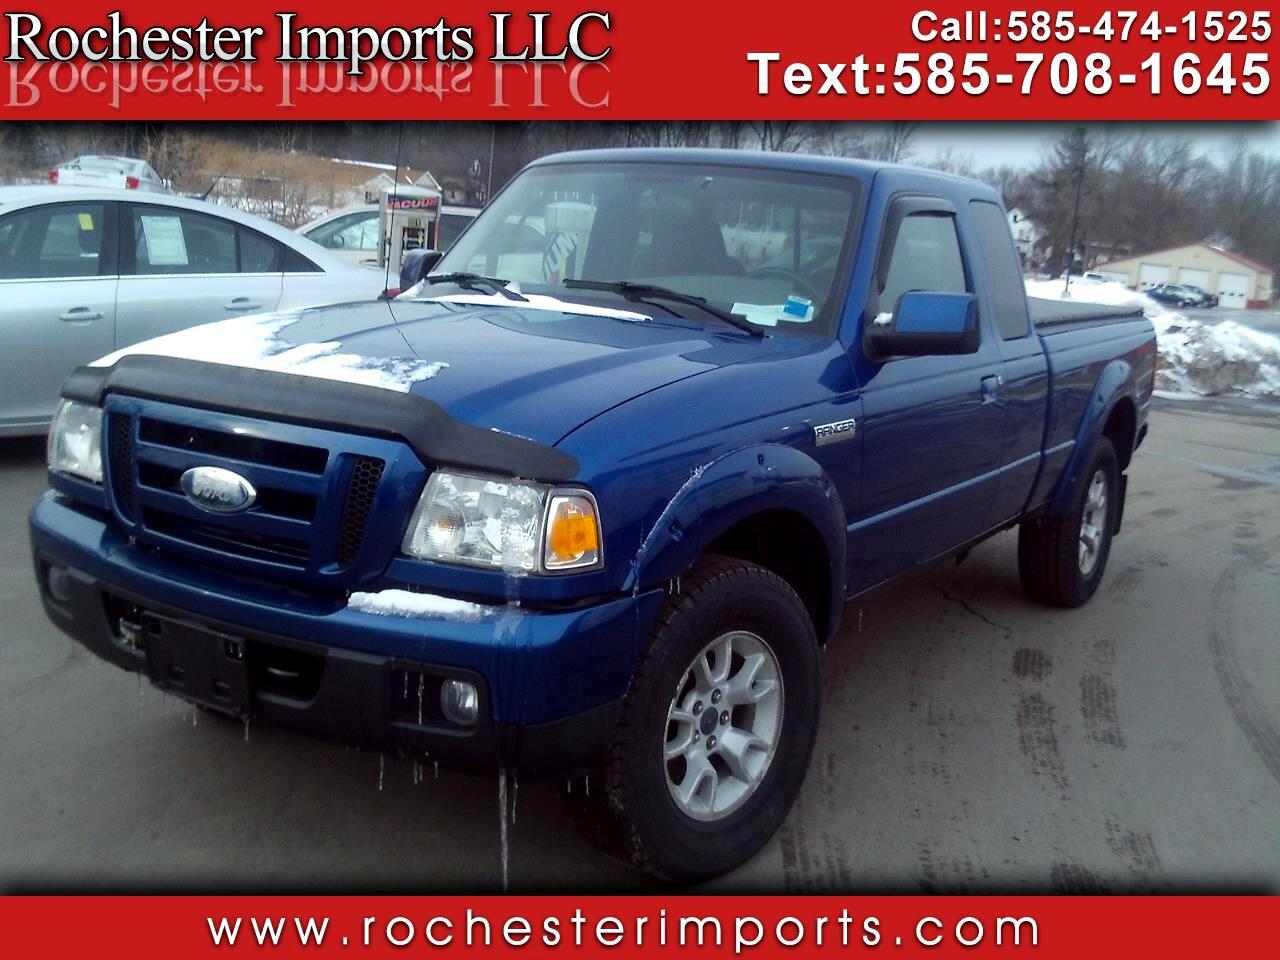 "Ford Ranger 4WD 4dr SuperCab 126"" FX4 Lvl II 2007"